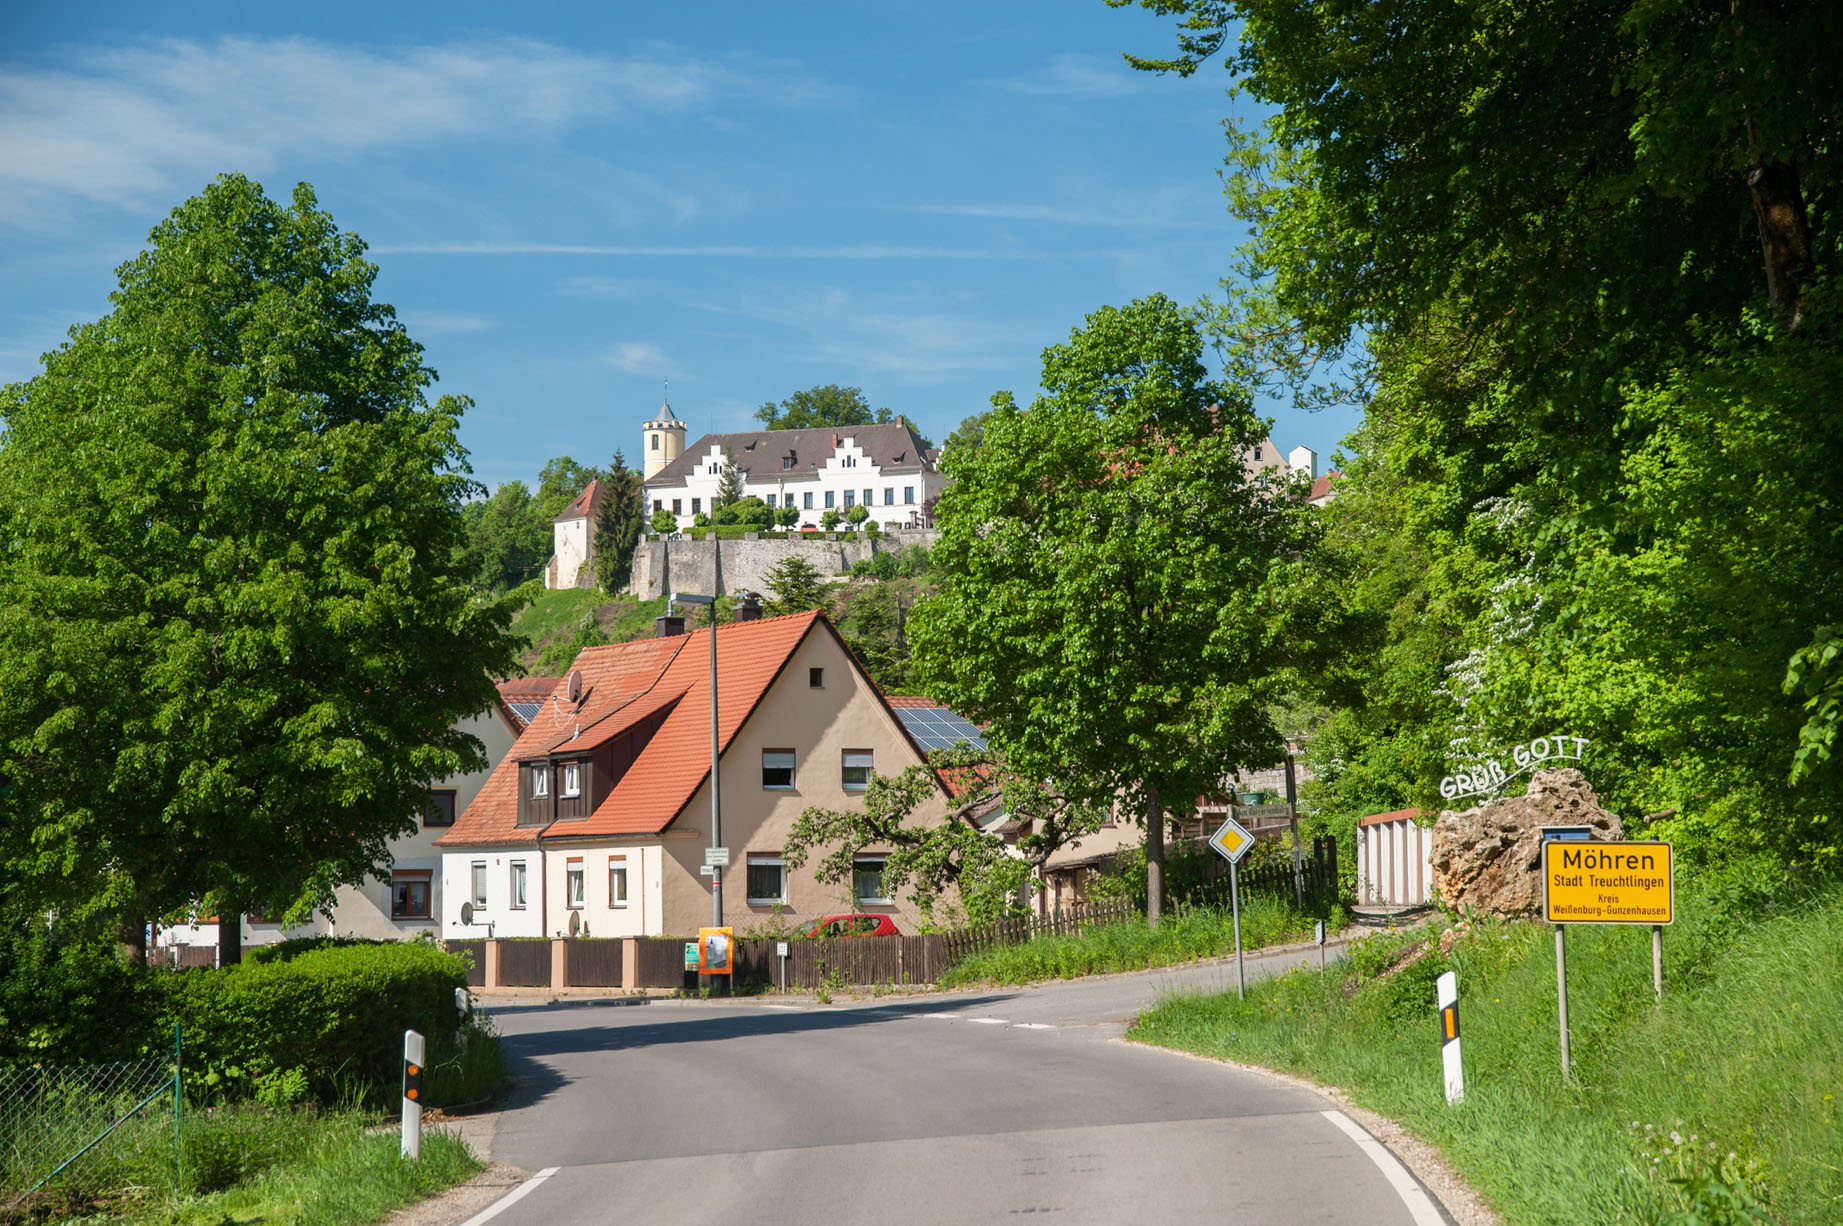 Dorpsgezicht kasteel landgoed Schloss Möhren